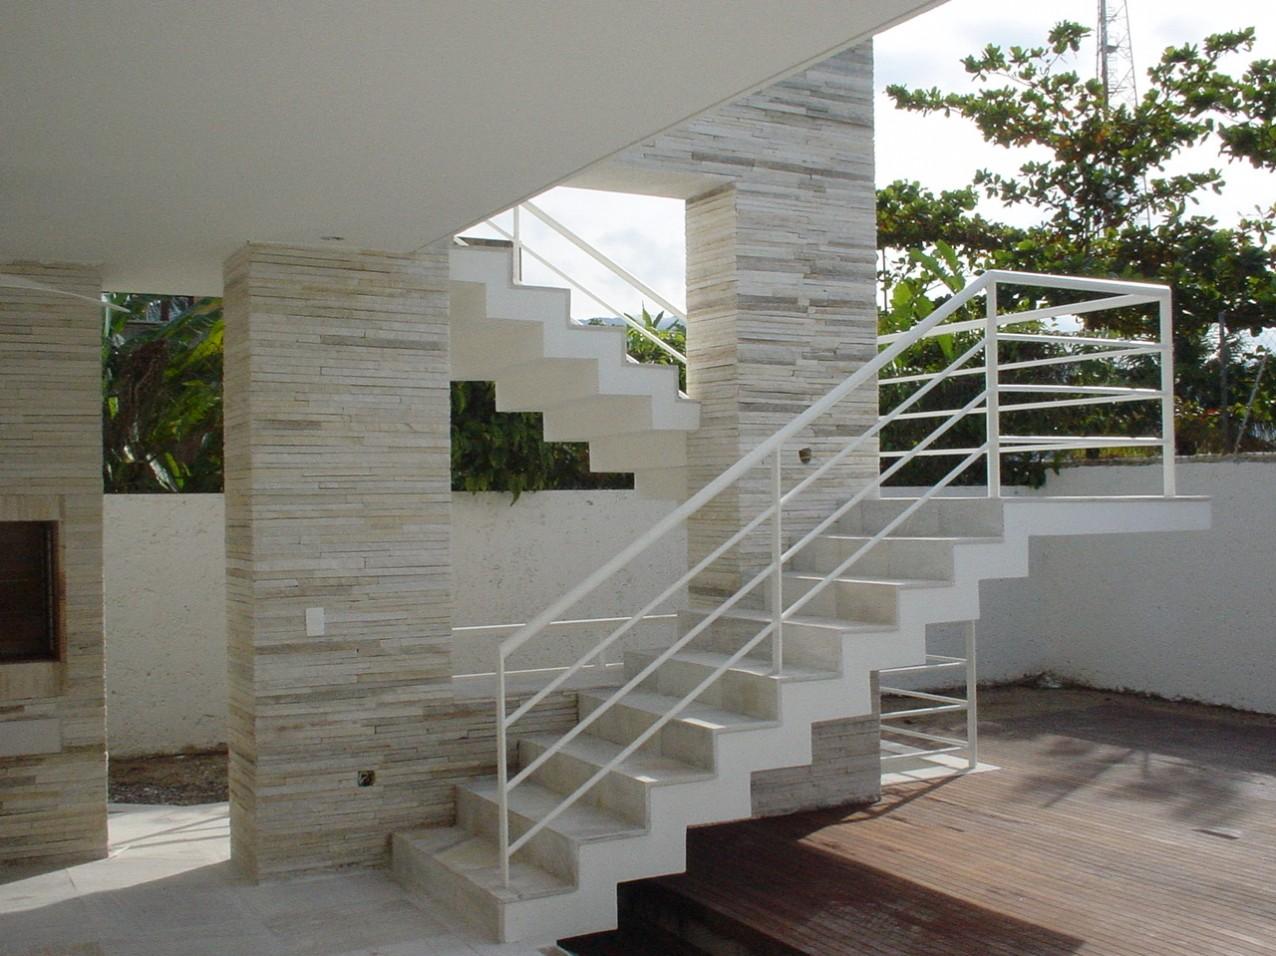 Obra residencial Praia da Baleia - Piscina